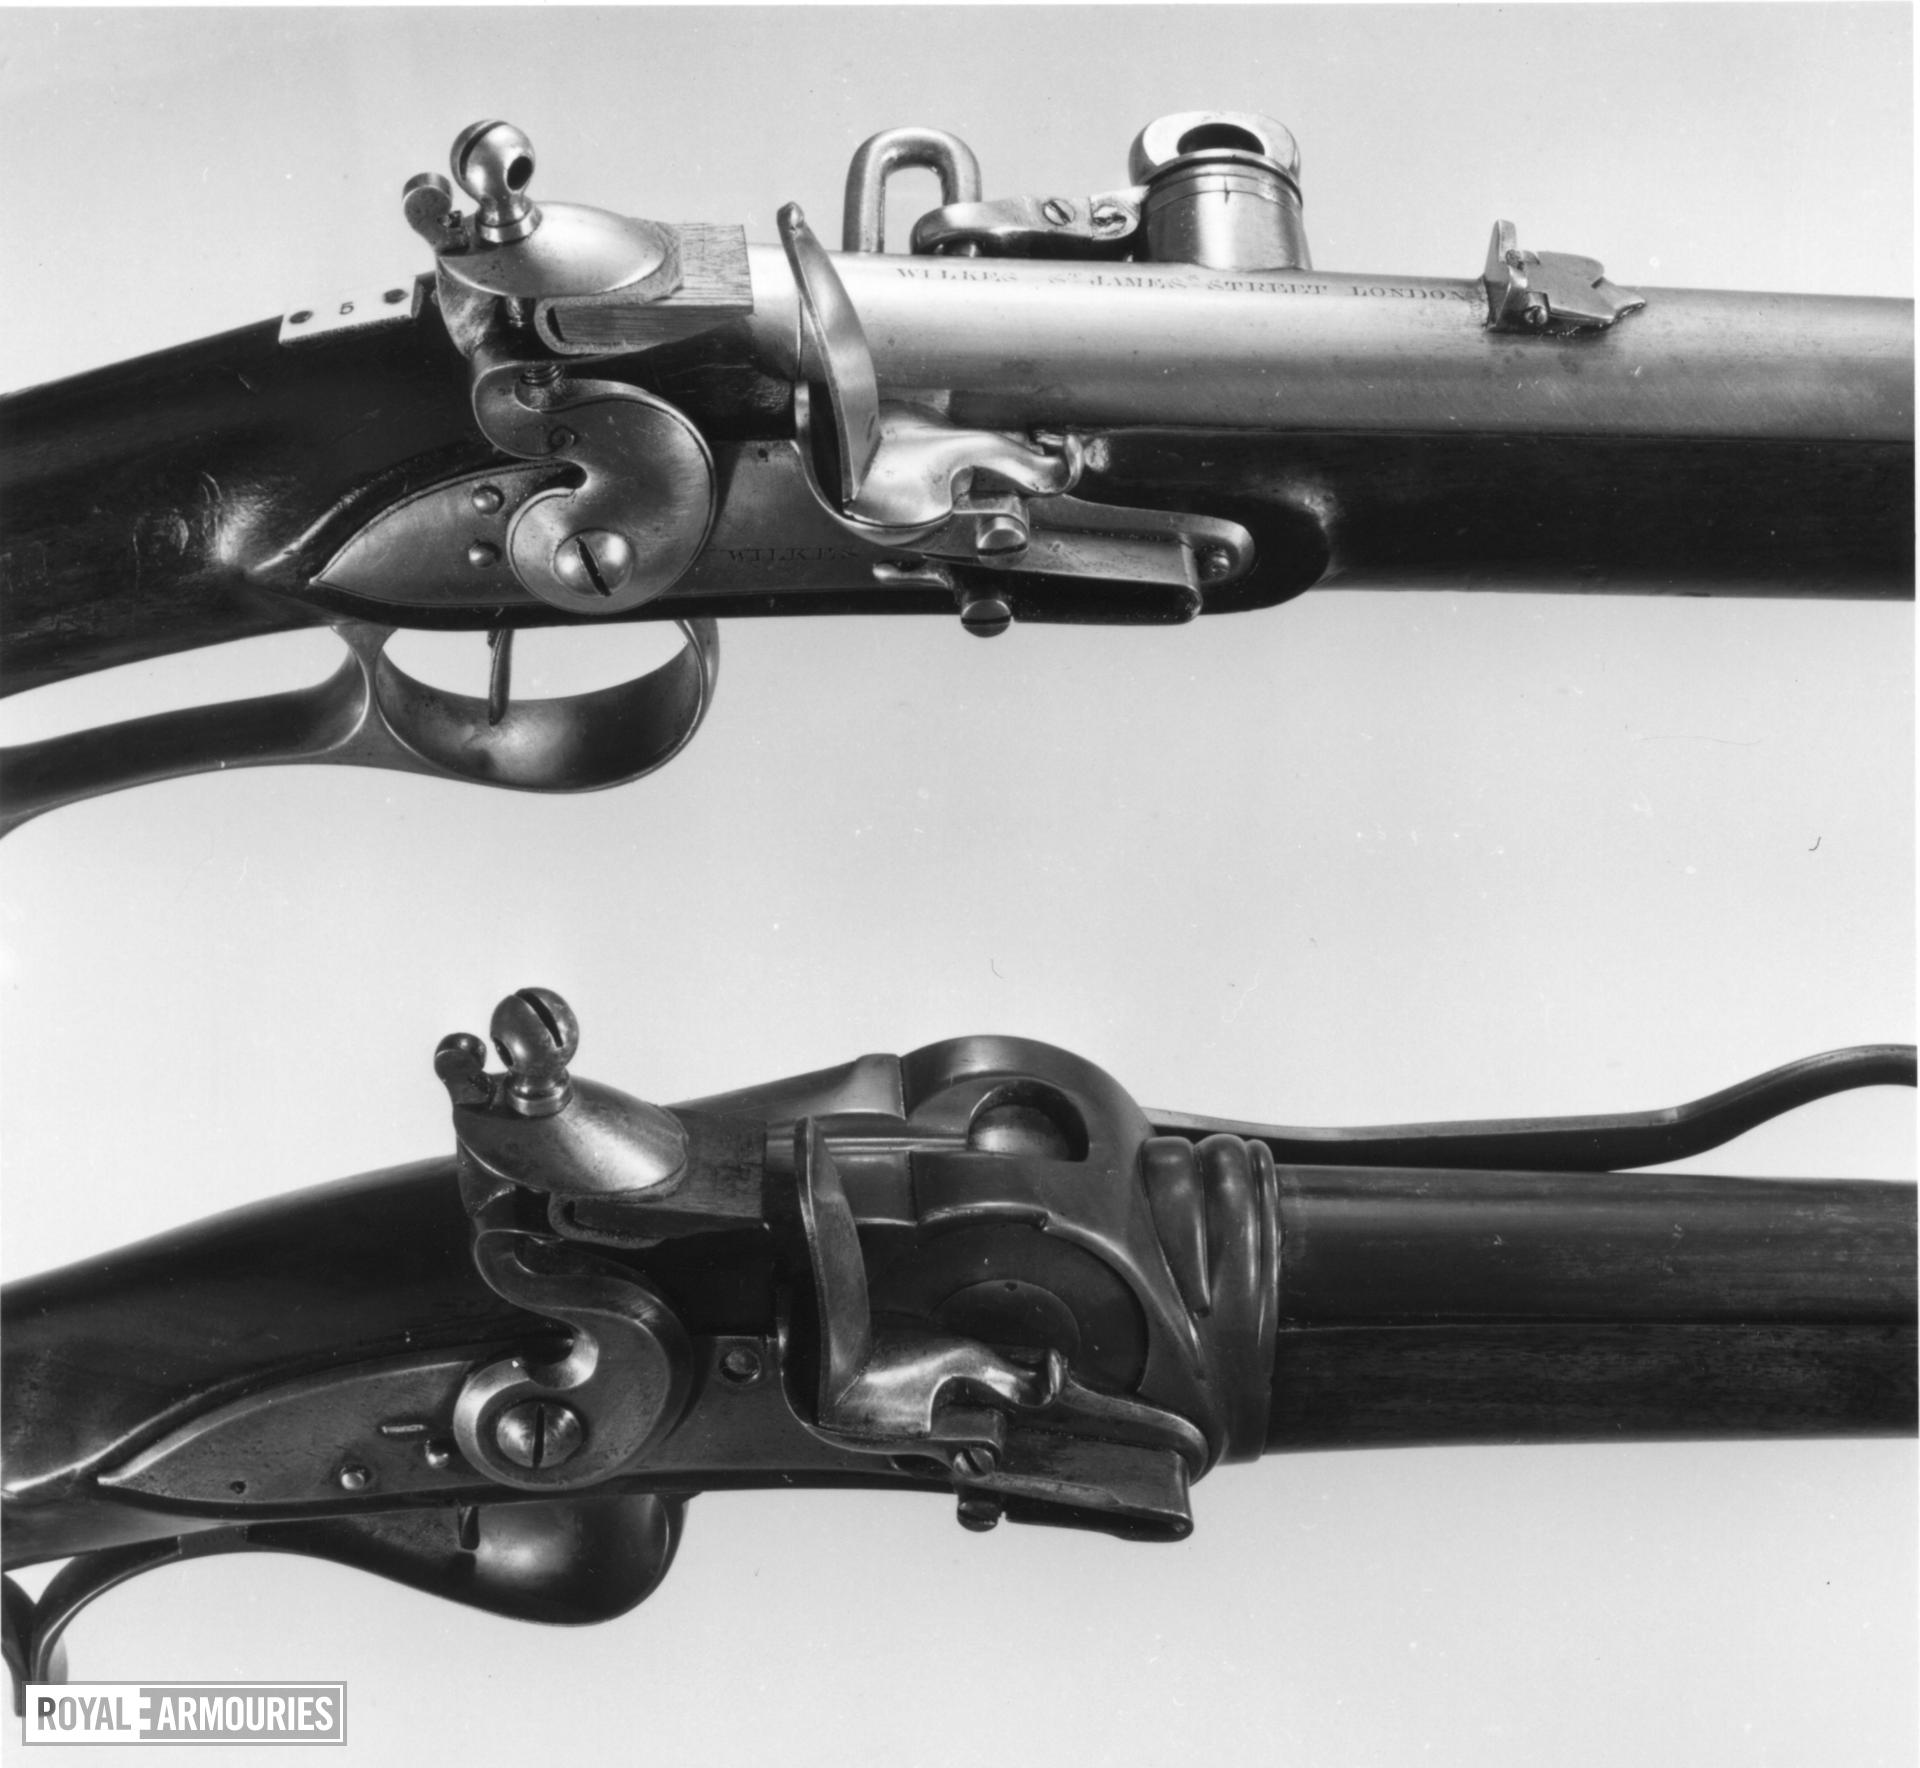 Flintlock breech-loading rifle - Hulme's Rifle Rotating-breech rifle